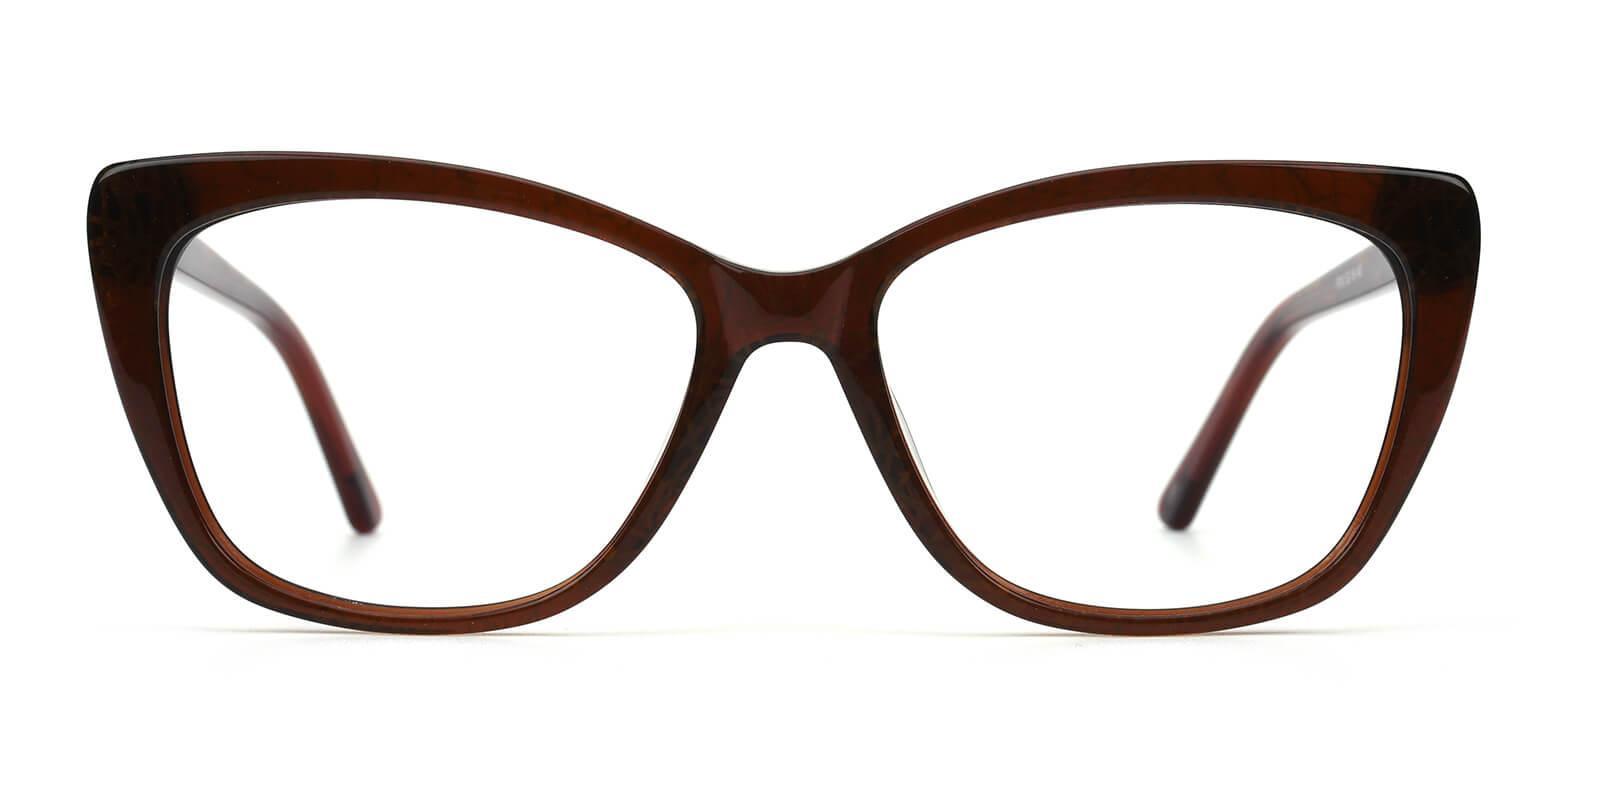 Kiko-Leopard-Cat-Acetate-Eyeglasses-additional2